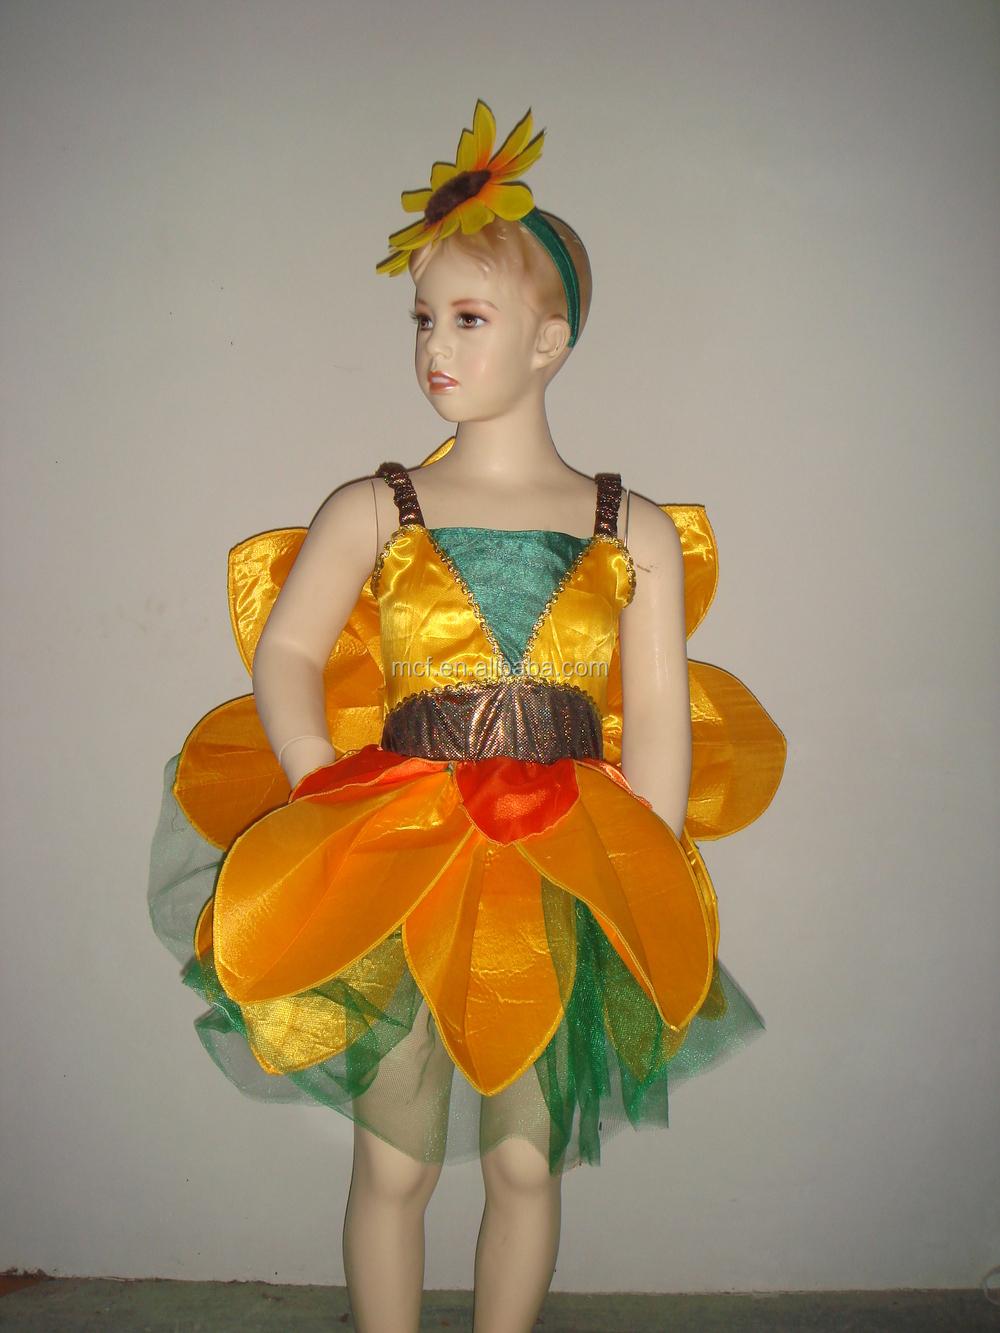 JPG 27161.  sc 1 st  Alibaba & Halloween Party Girls Cheap Fairy Tale Arab Arabian Arabic Princess ...